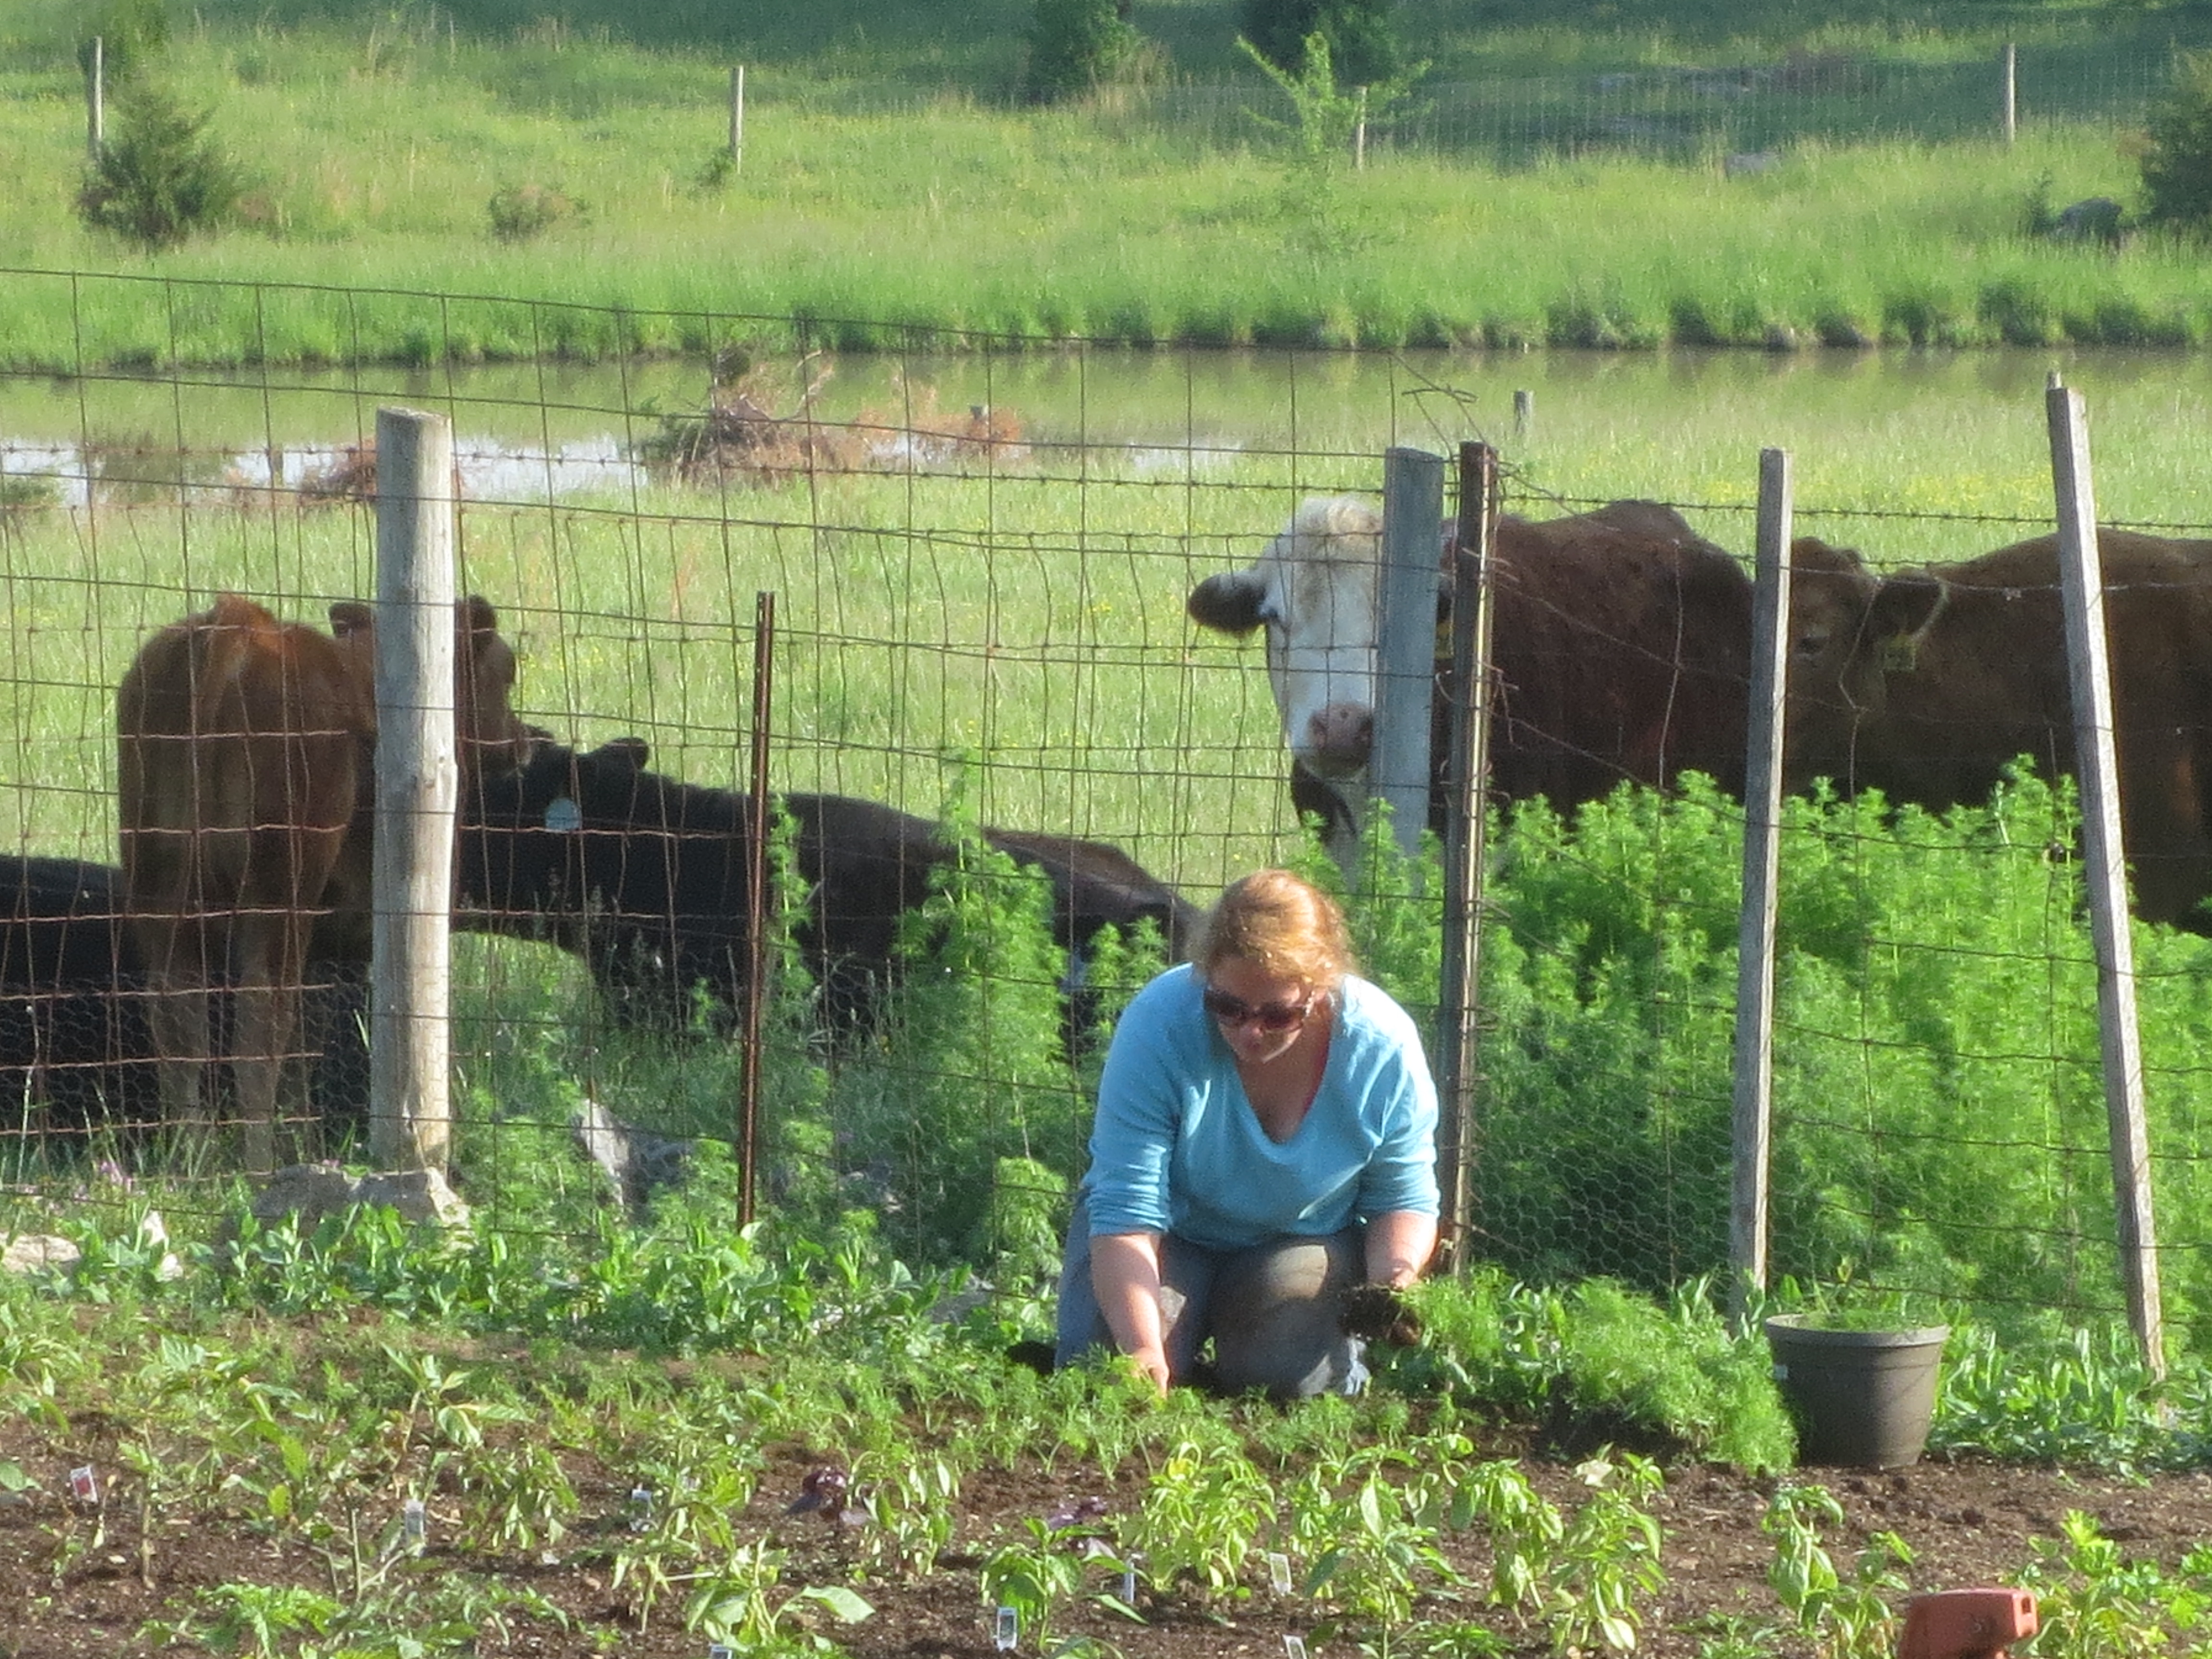 Shenandoah Valley Farm To Table